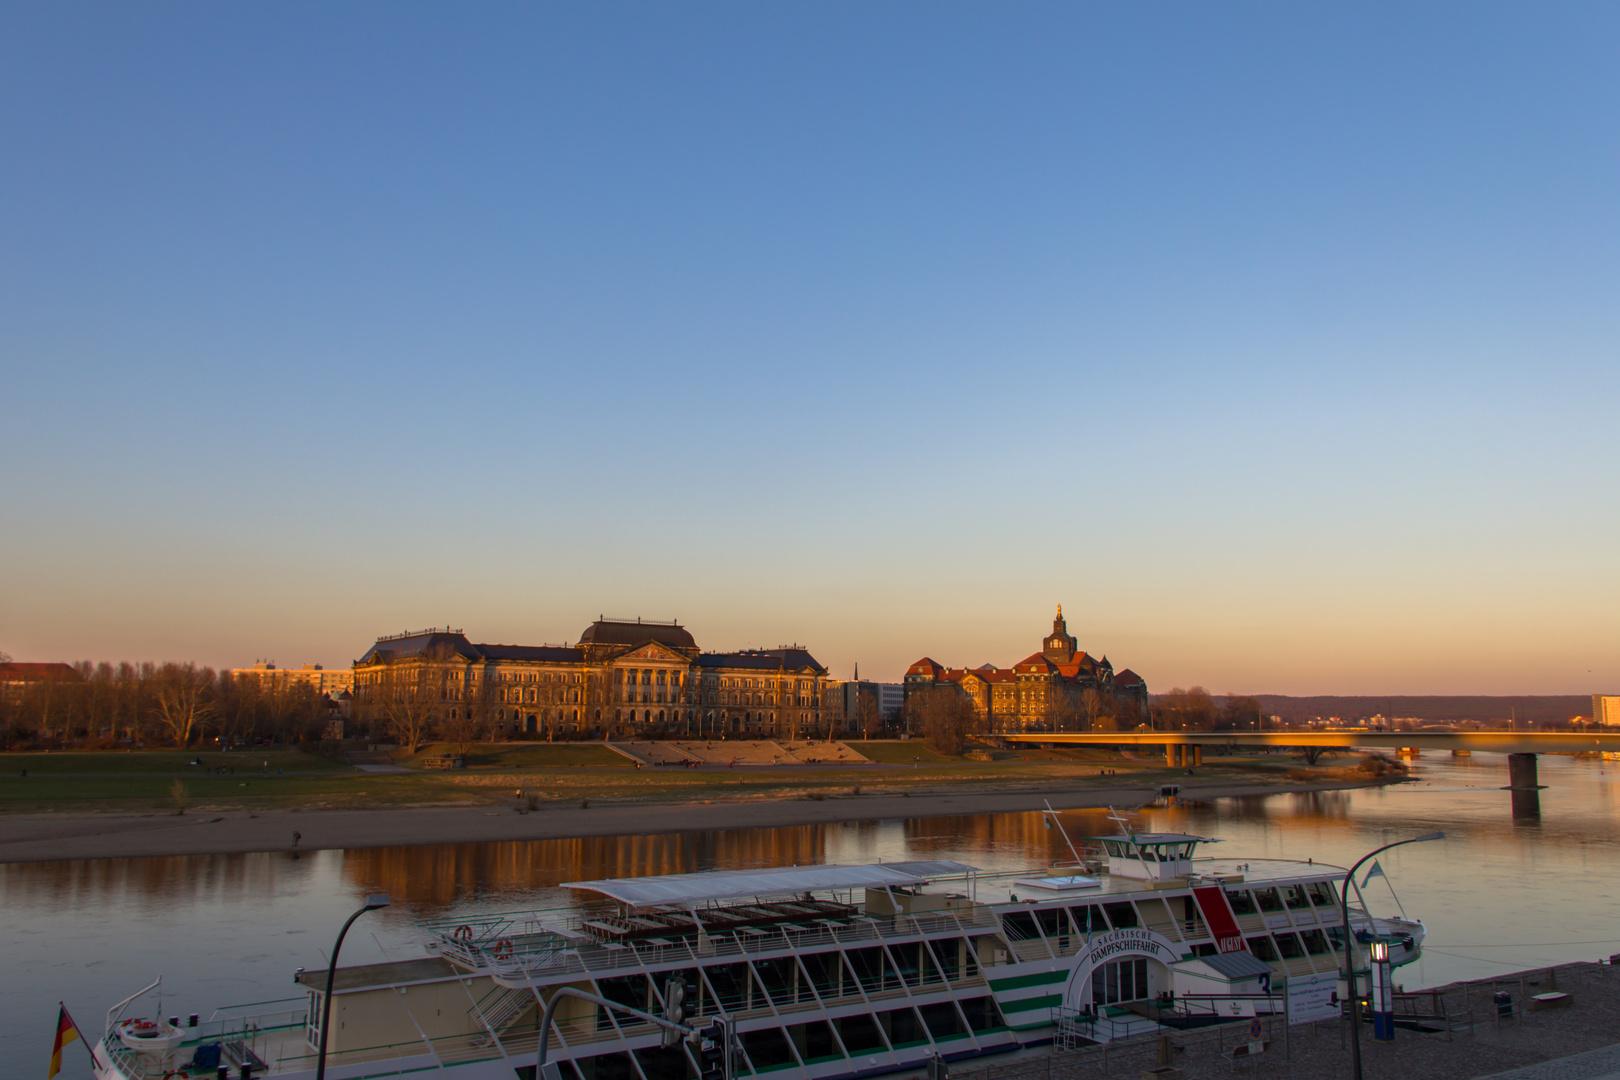 Finanzministerium zu Dresden